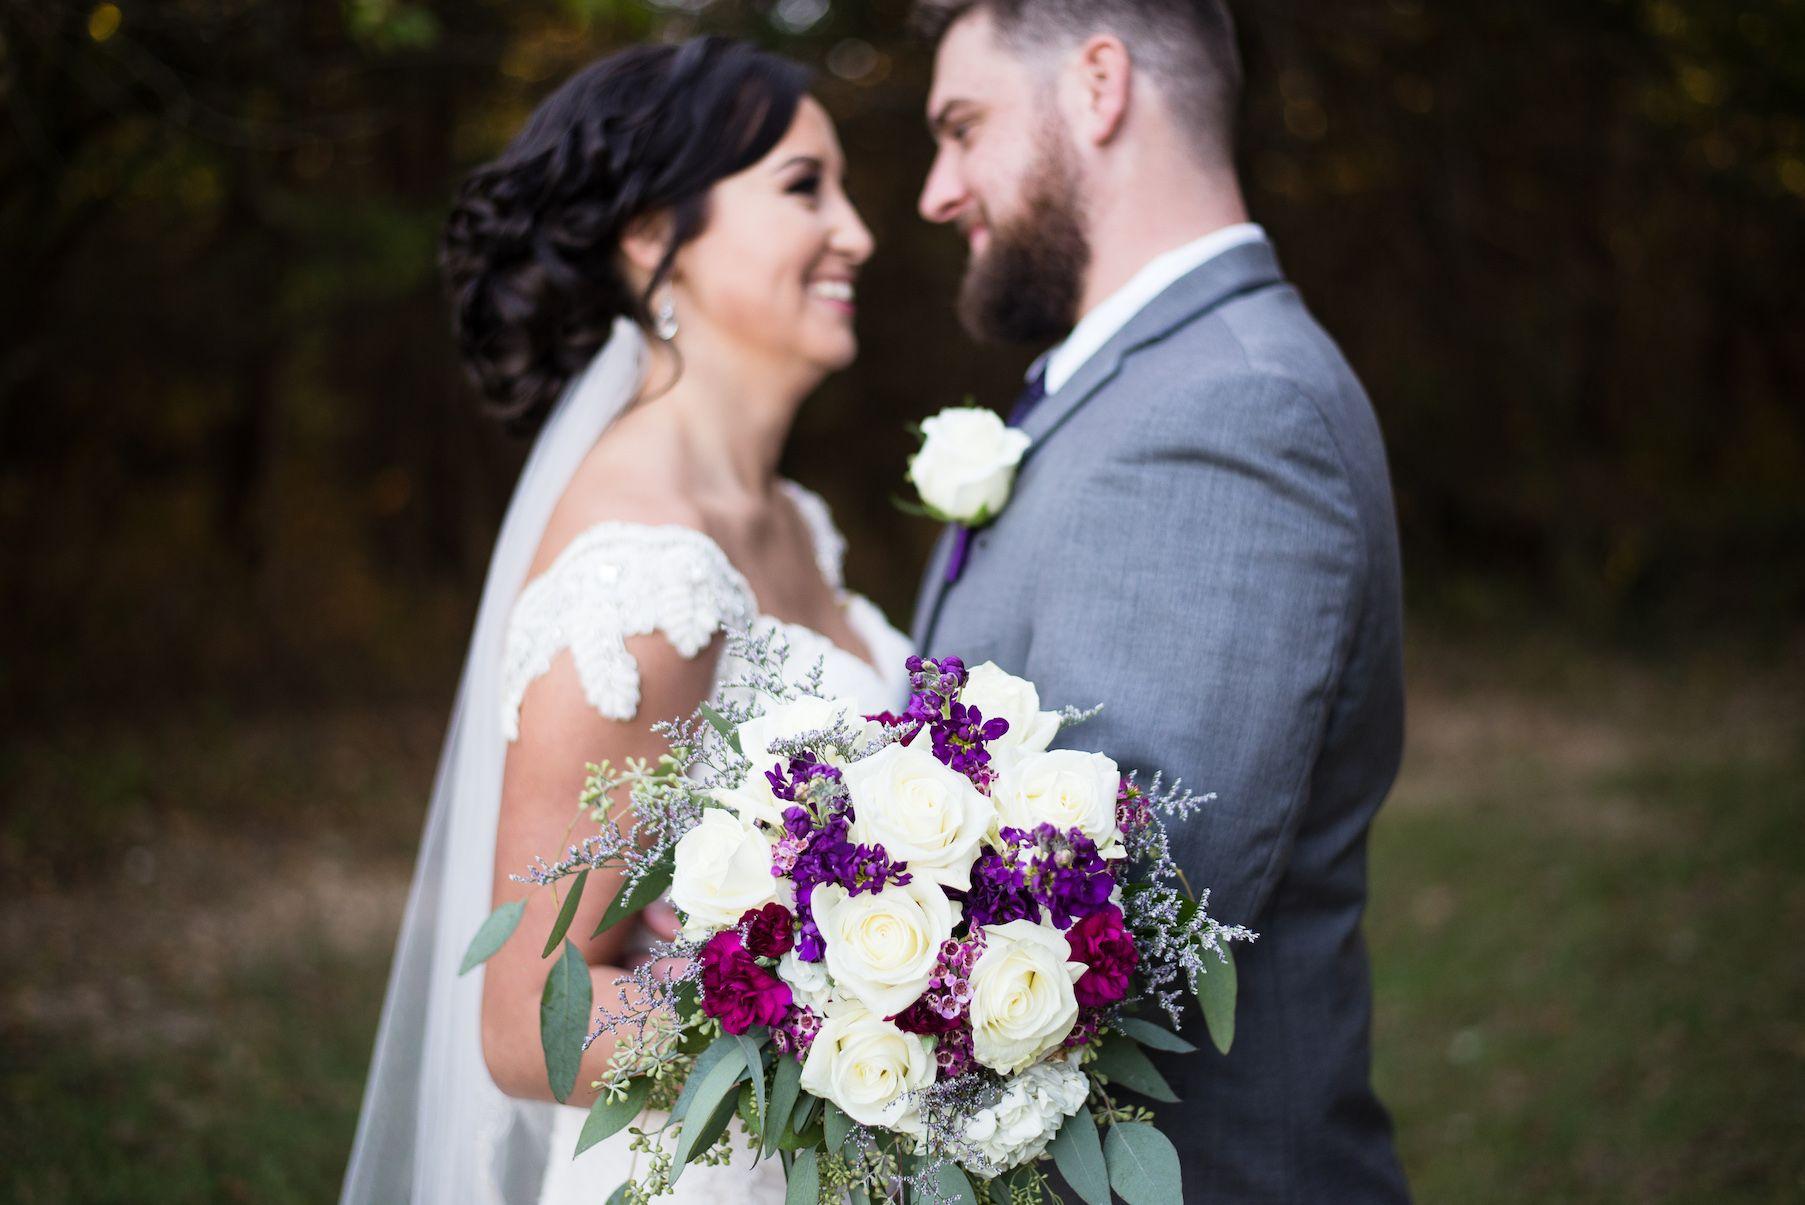 Ashley Elizabeth Photography Rustic Wedding Lace Burlap Decor